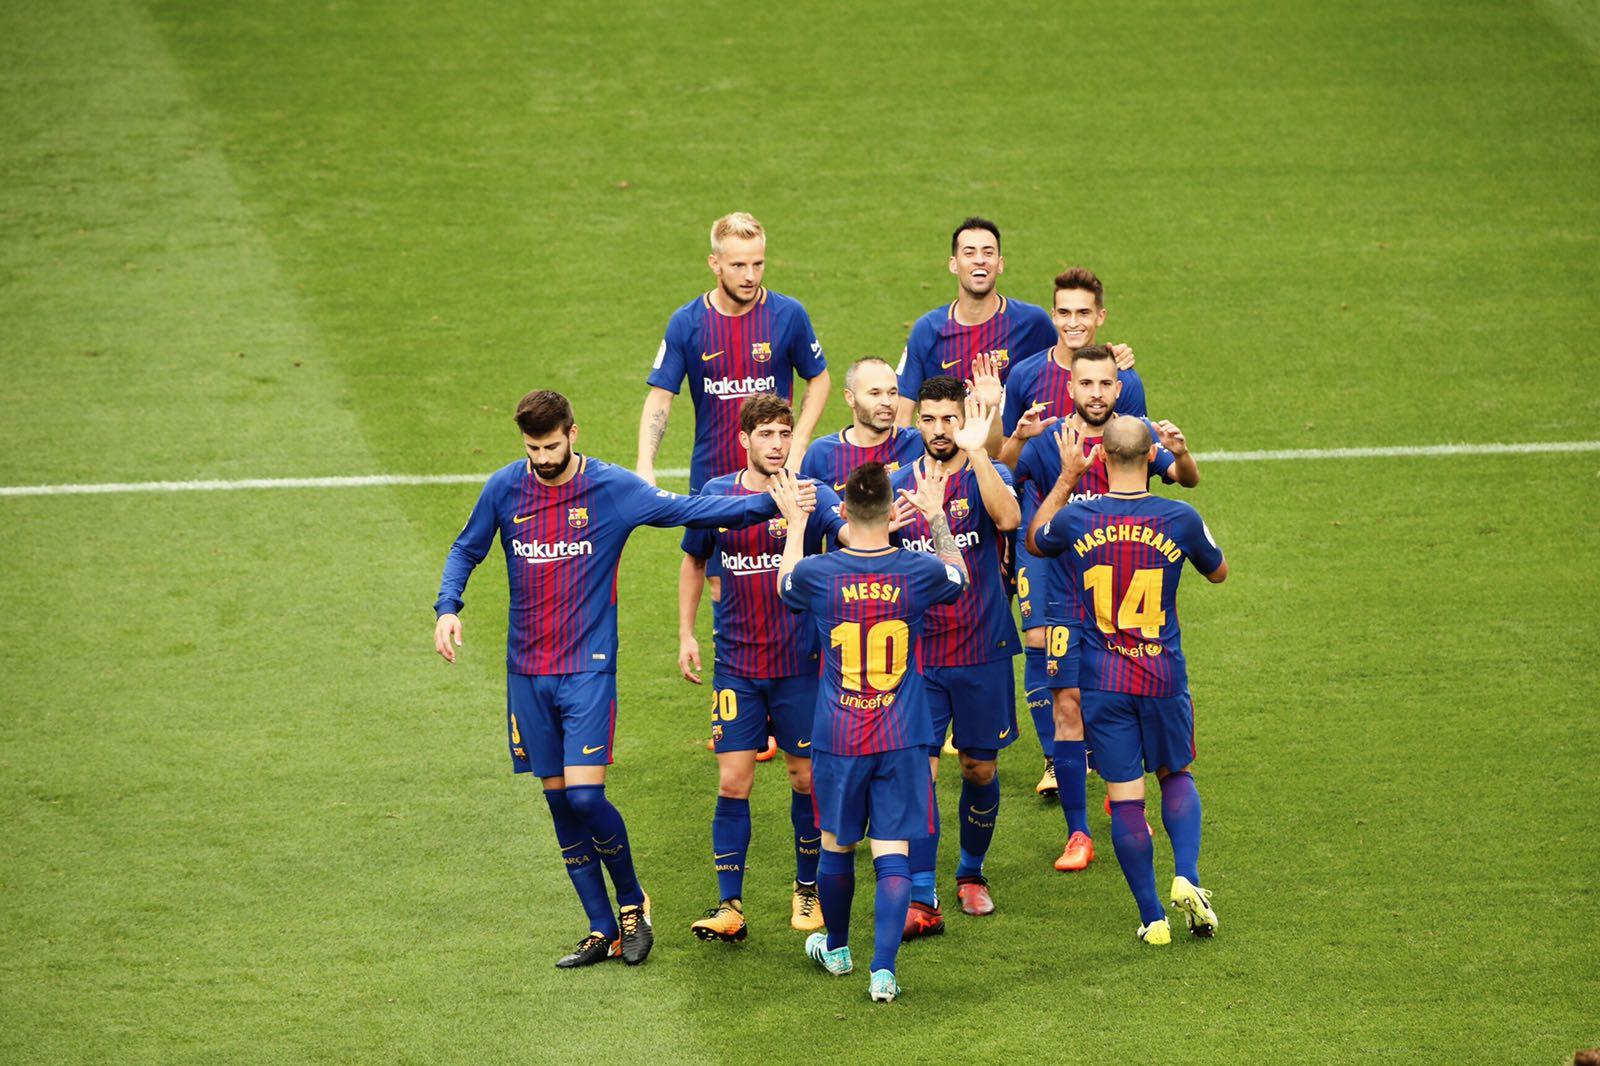 �� #BarçaLasPalmas in pictures ���� https://t.co/fKR7rQPIo1